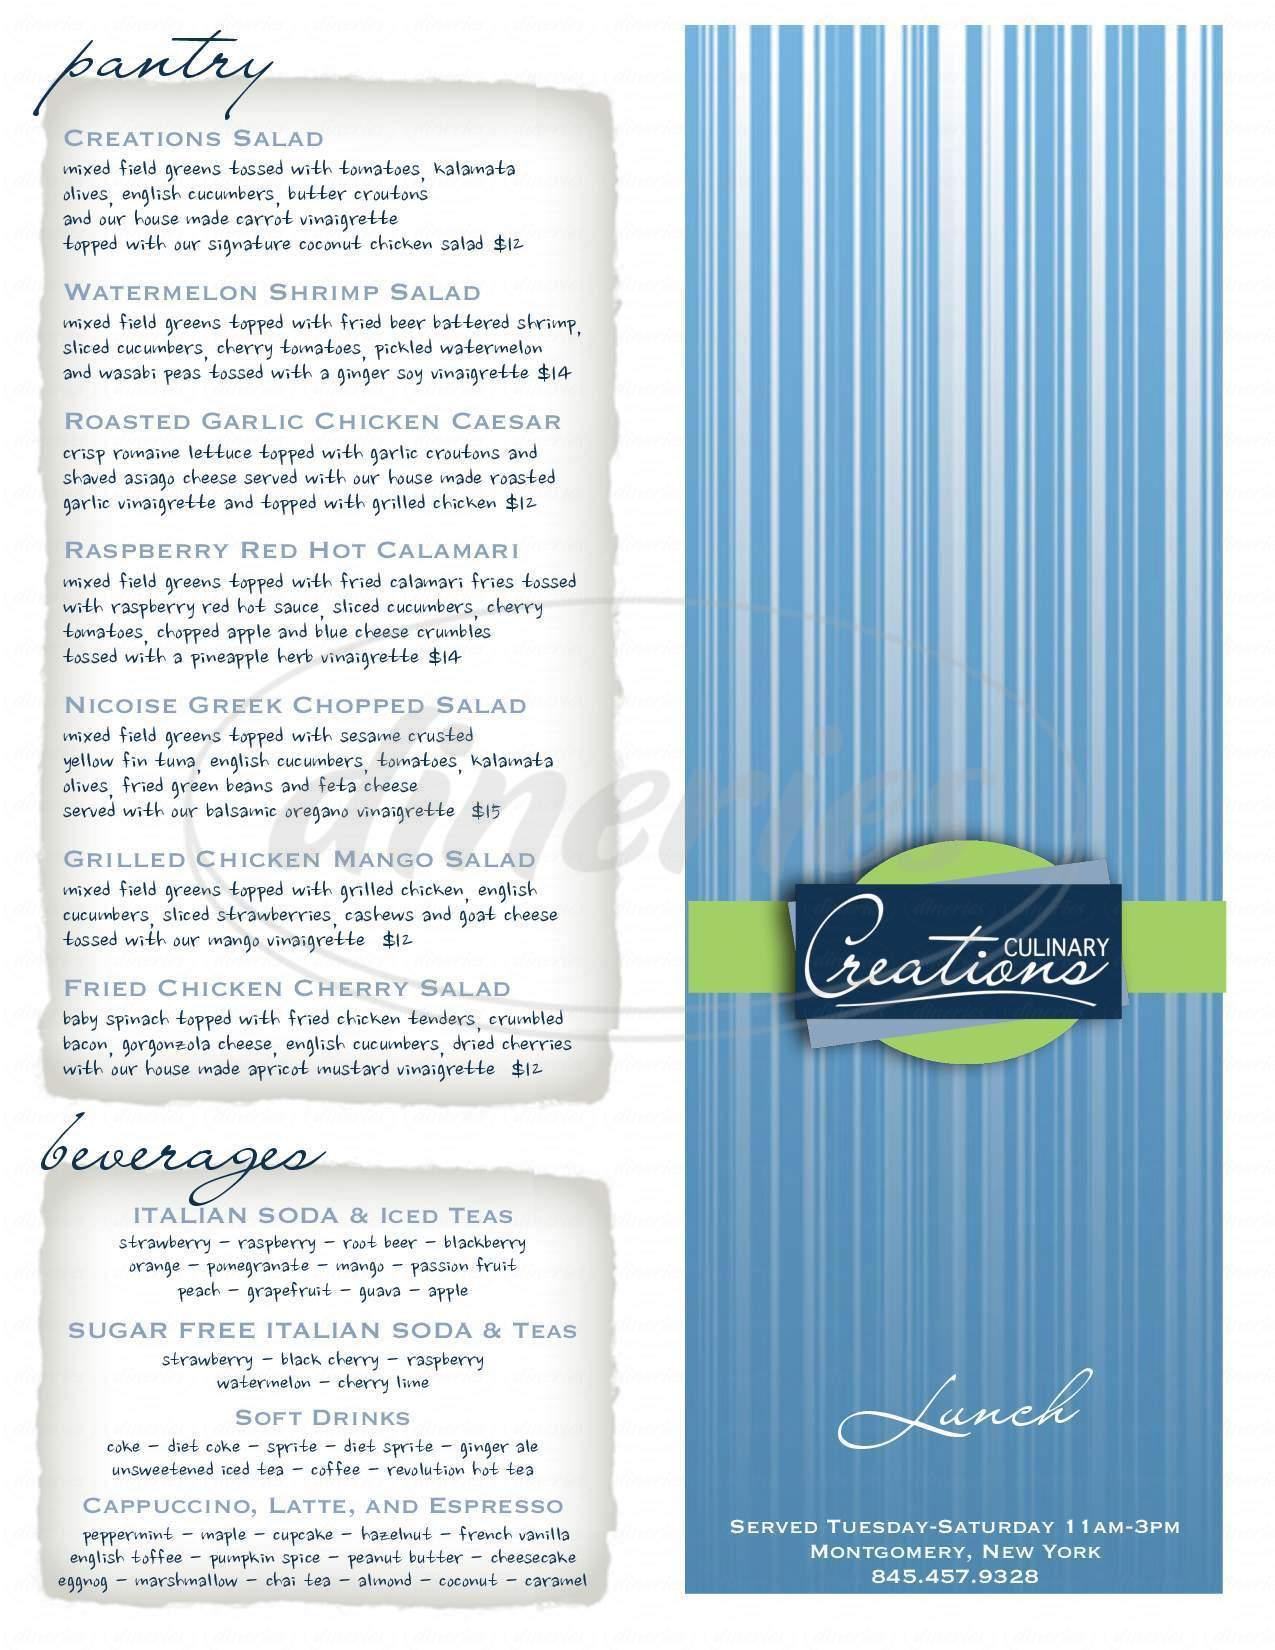 menu for Culinary Creations